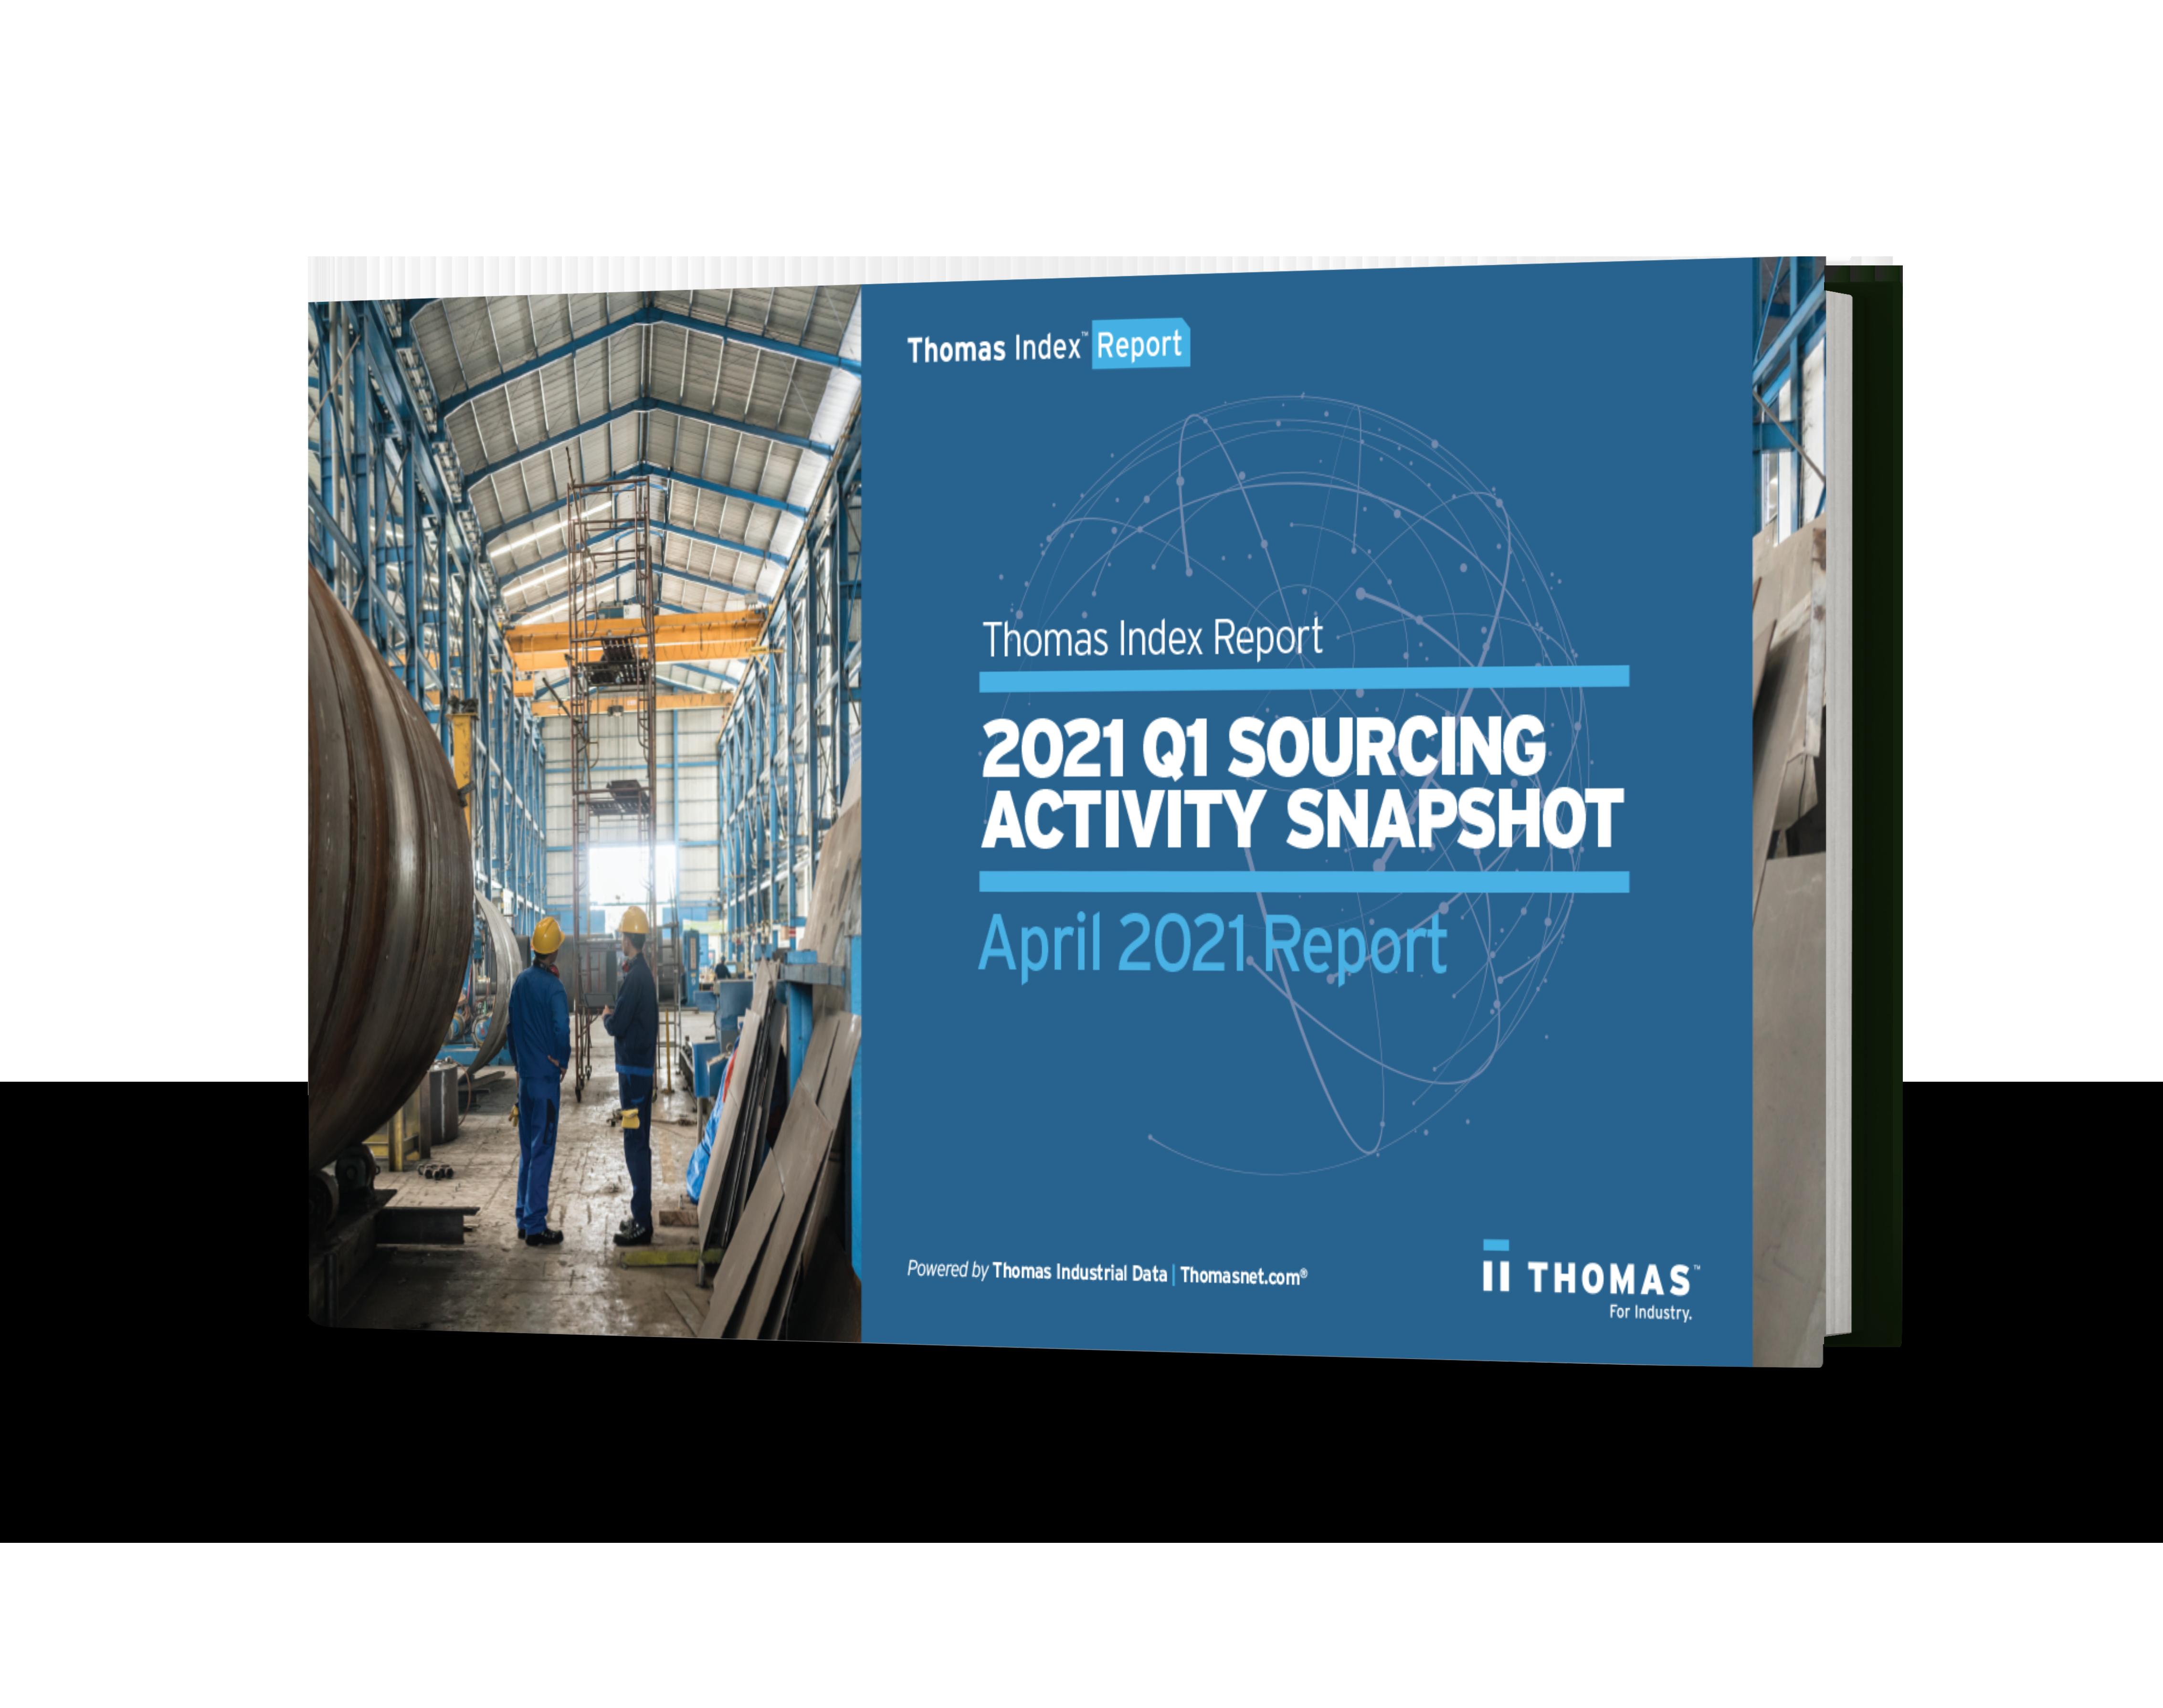 Q1 2021 Sourcing Activity Thumbnail